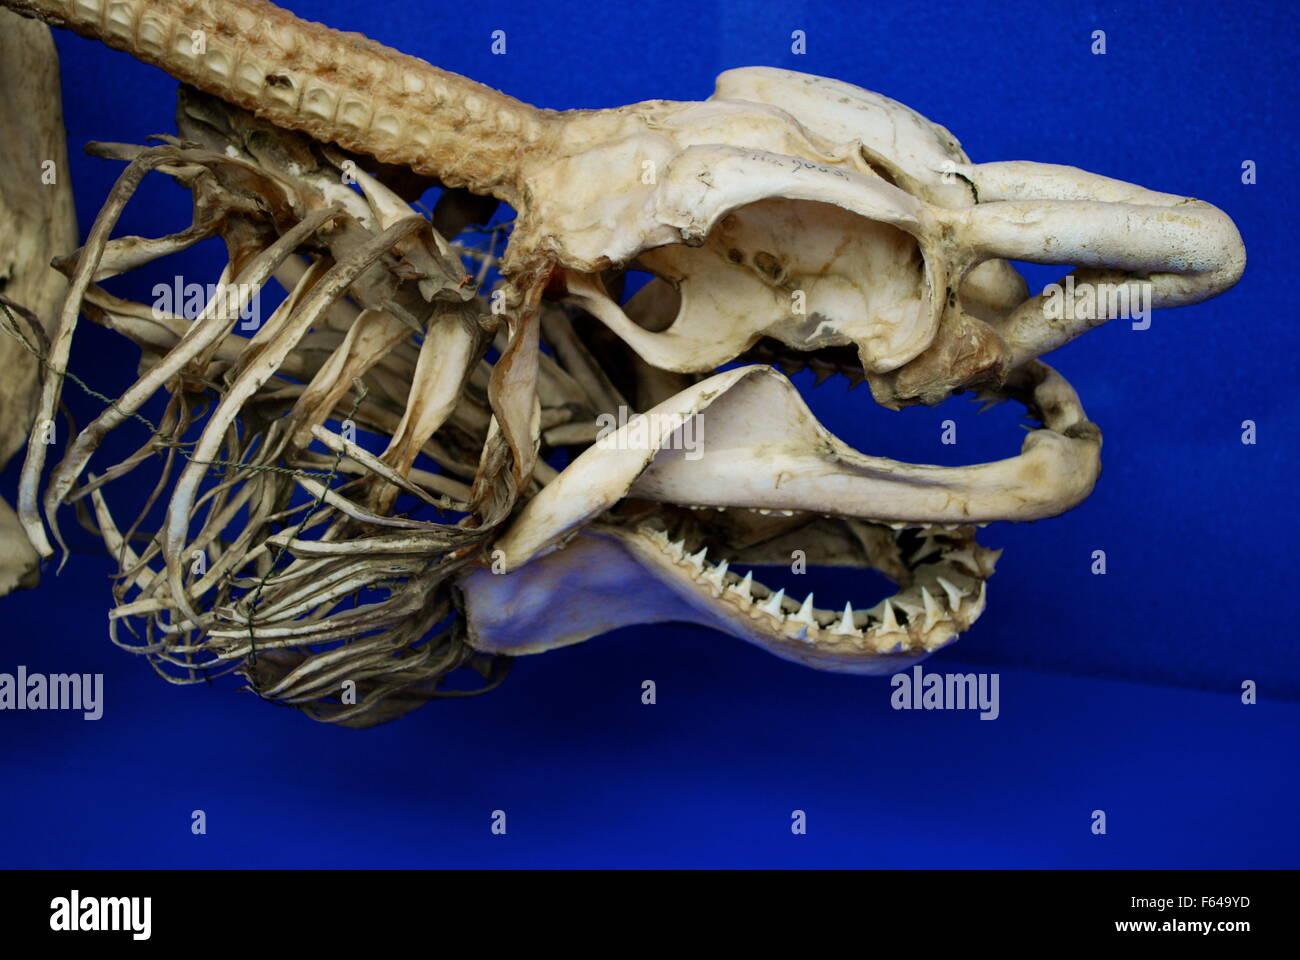 Shark skeleton, Oxford University Museum of Natural History Stock Photo, Royalty Free Image ...